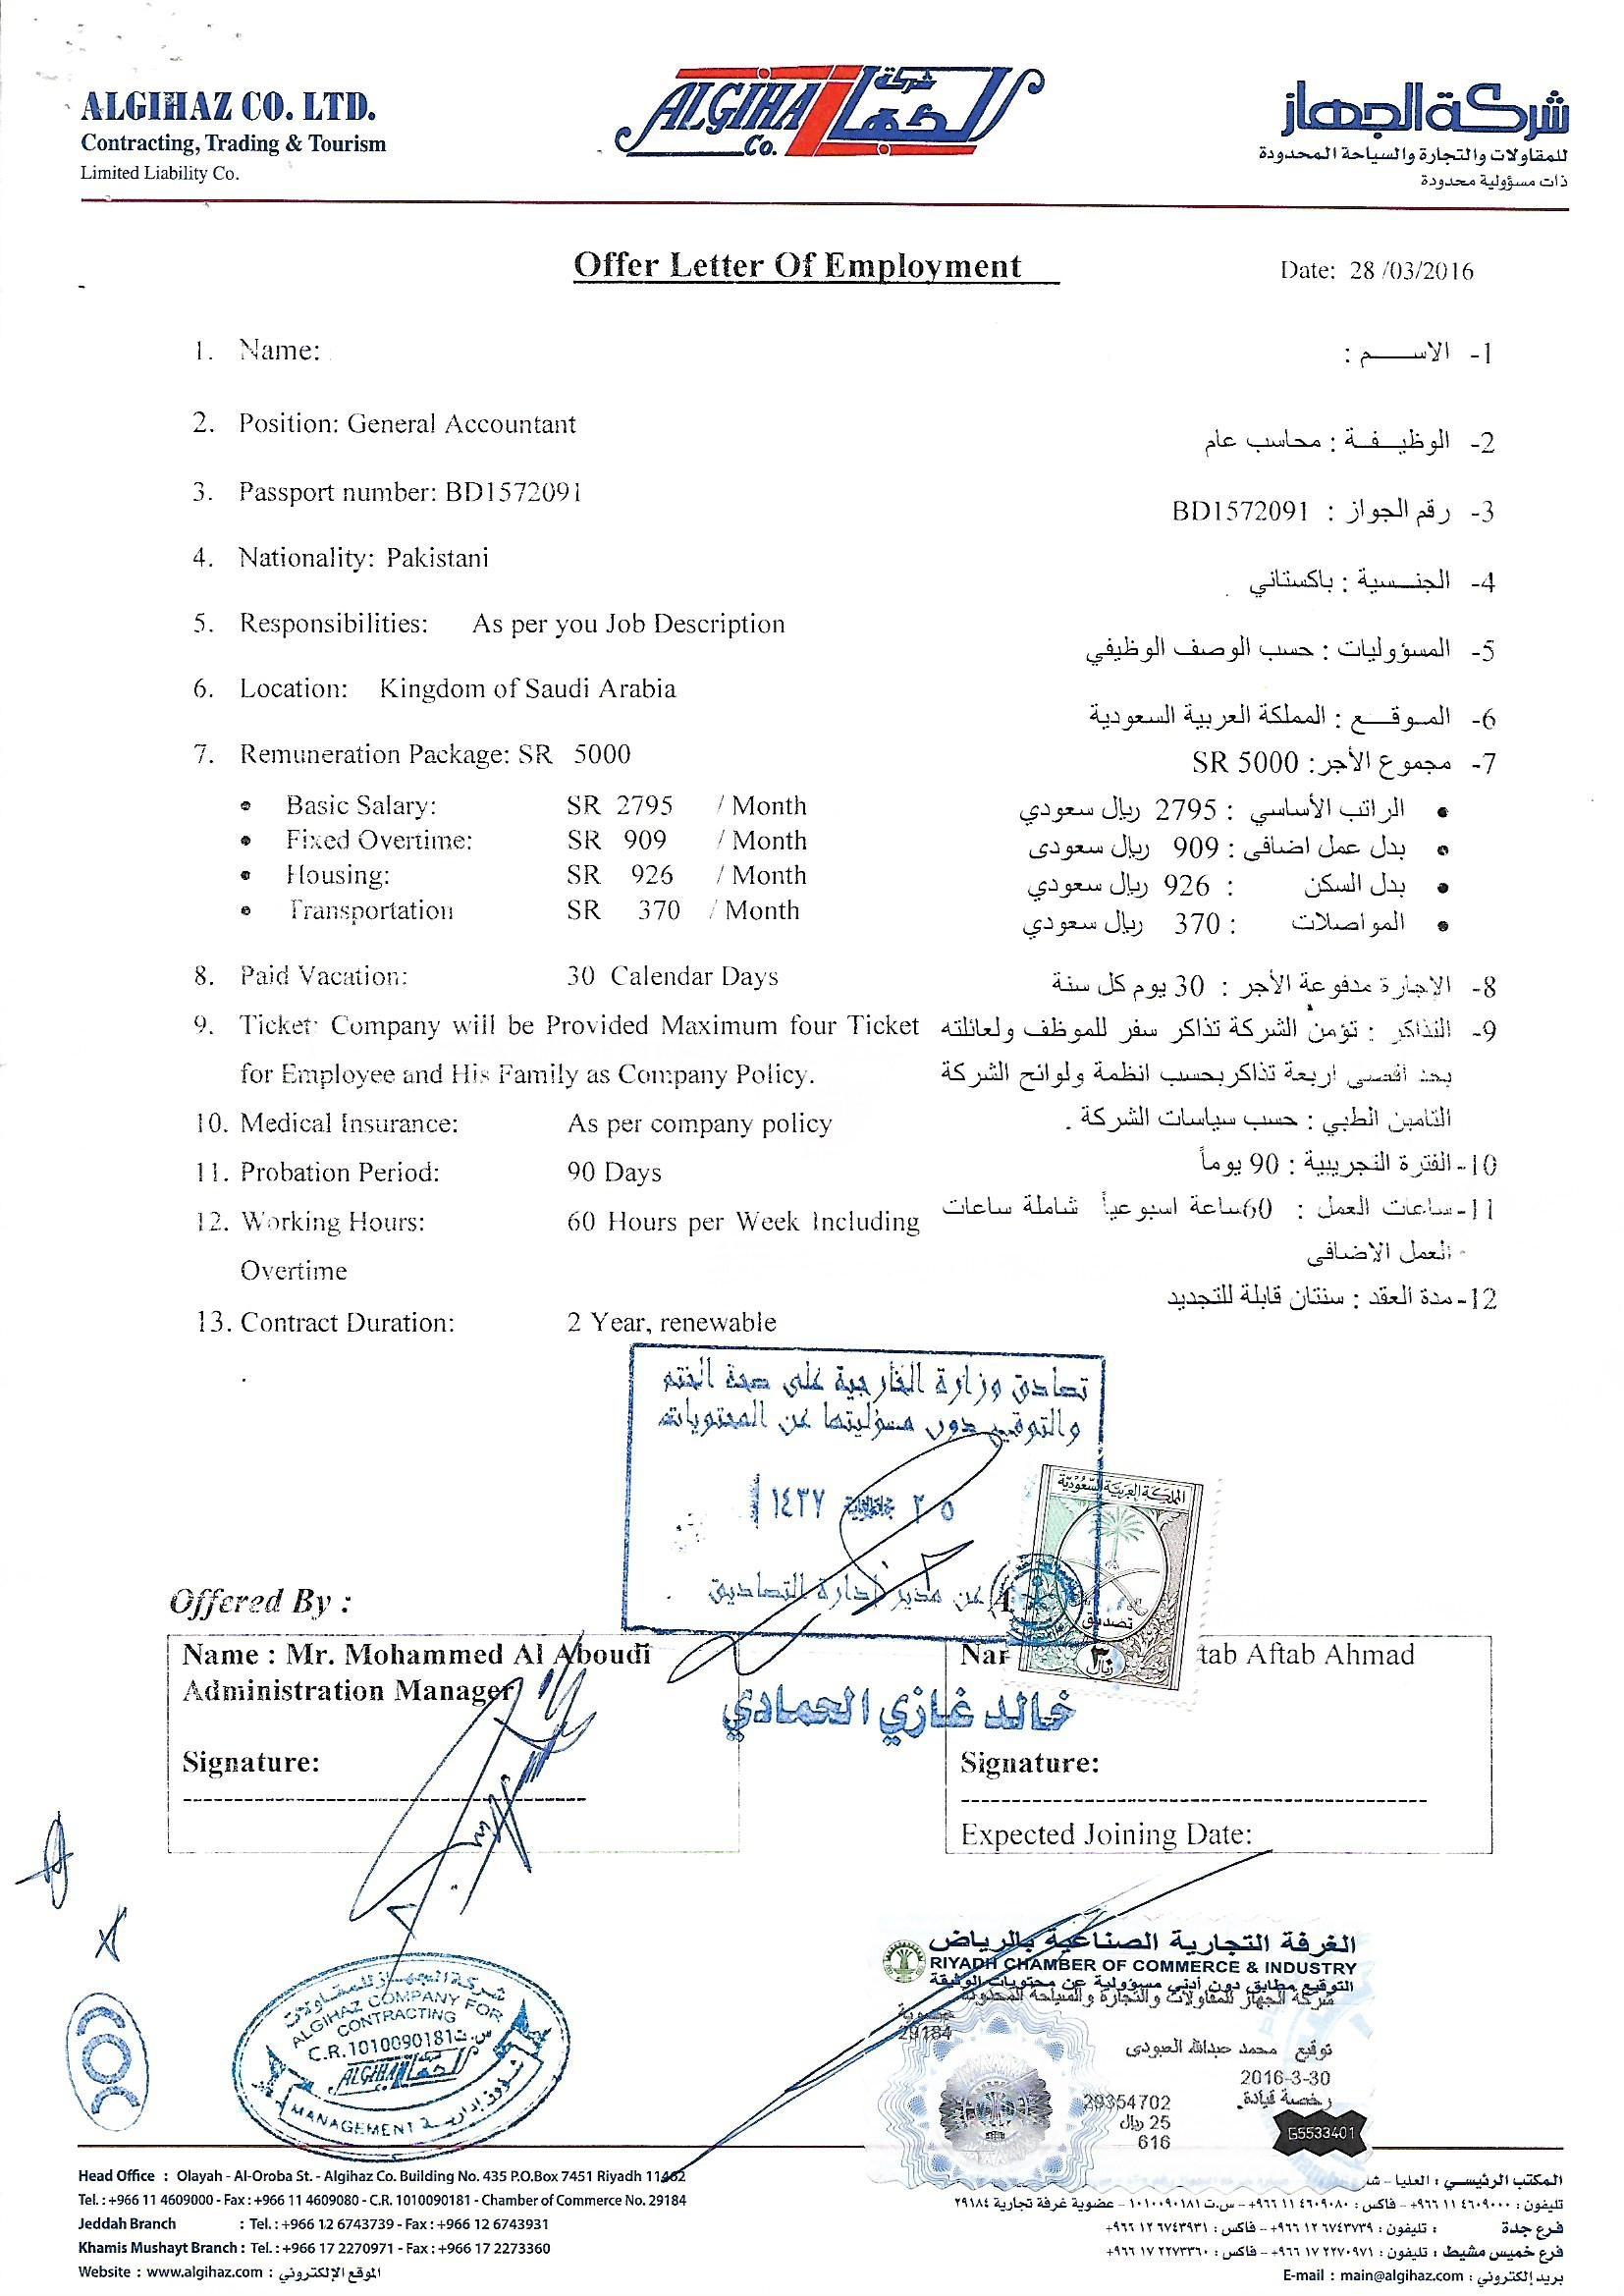 Document Degree Attestation From Saudi Embassy Ksa Embassy